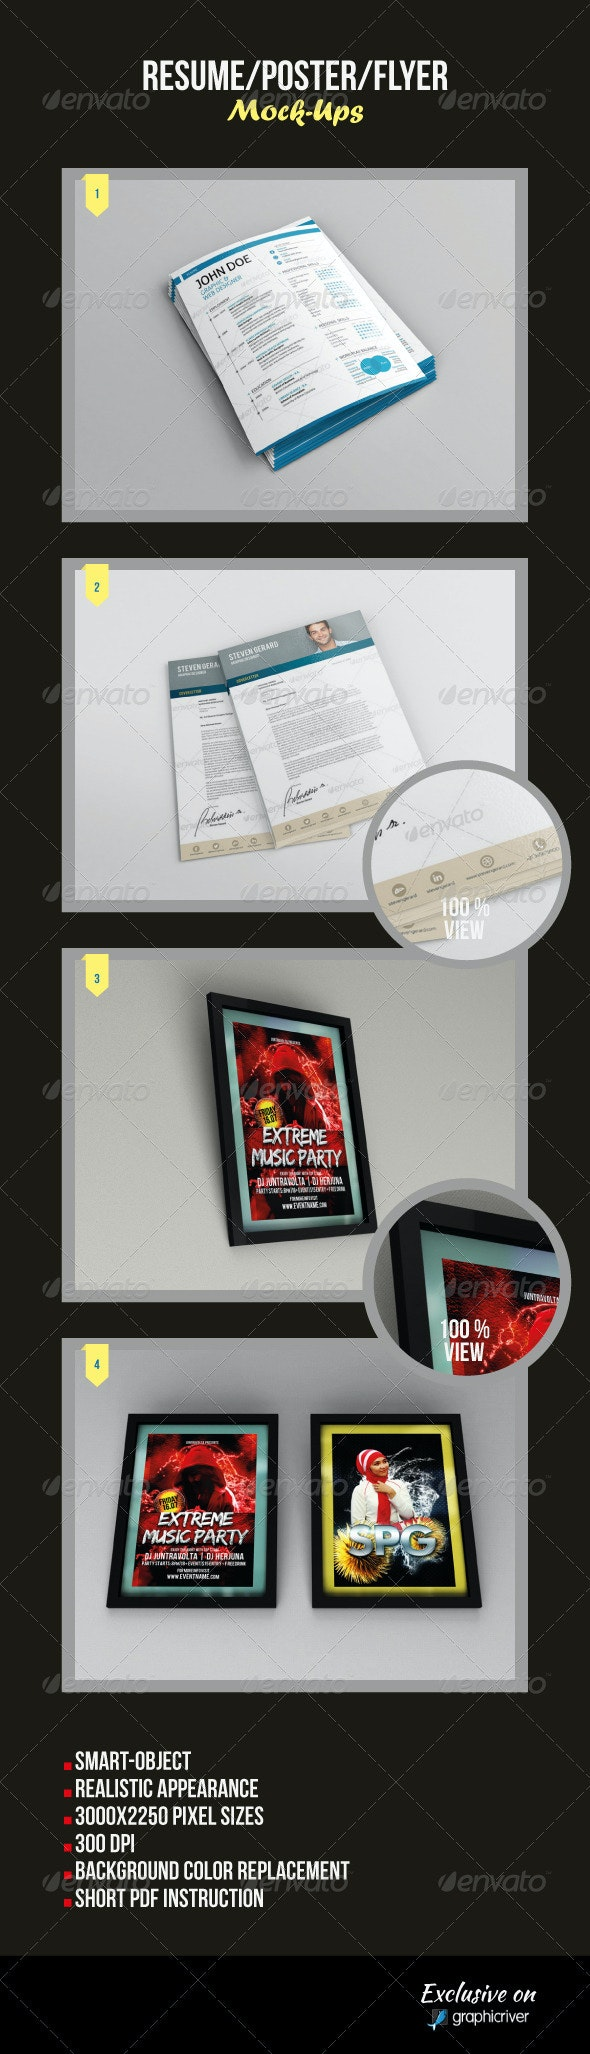 Resume/Poster/Flyer Mock-Ups - Flyers Print